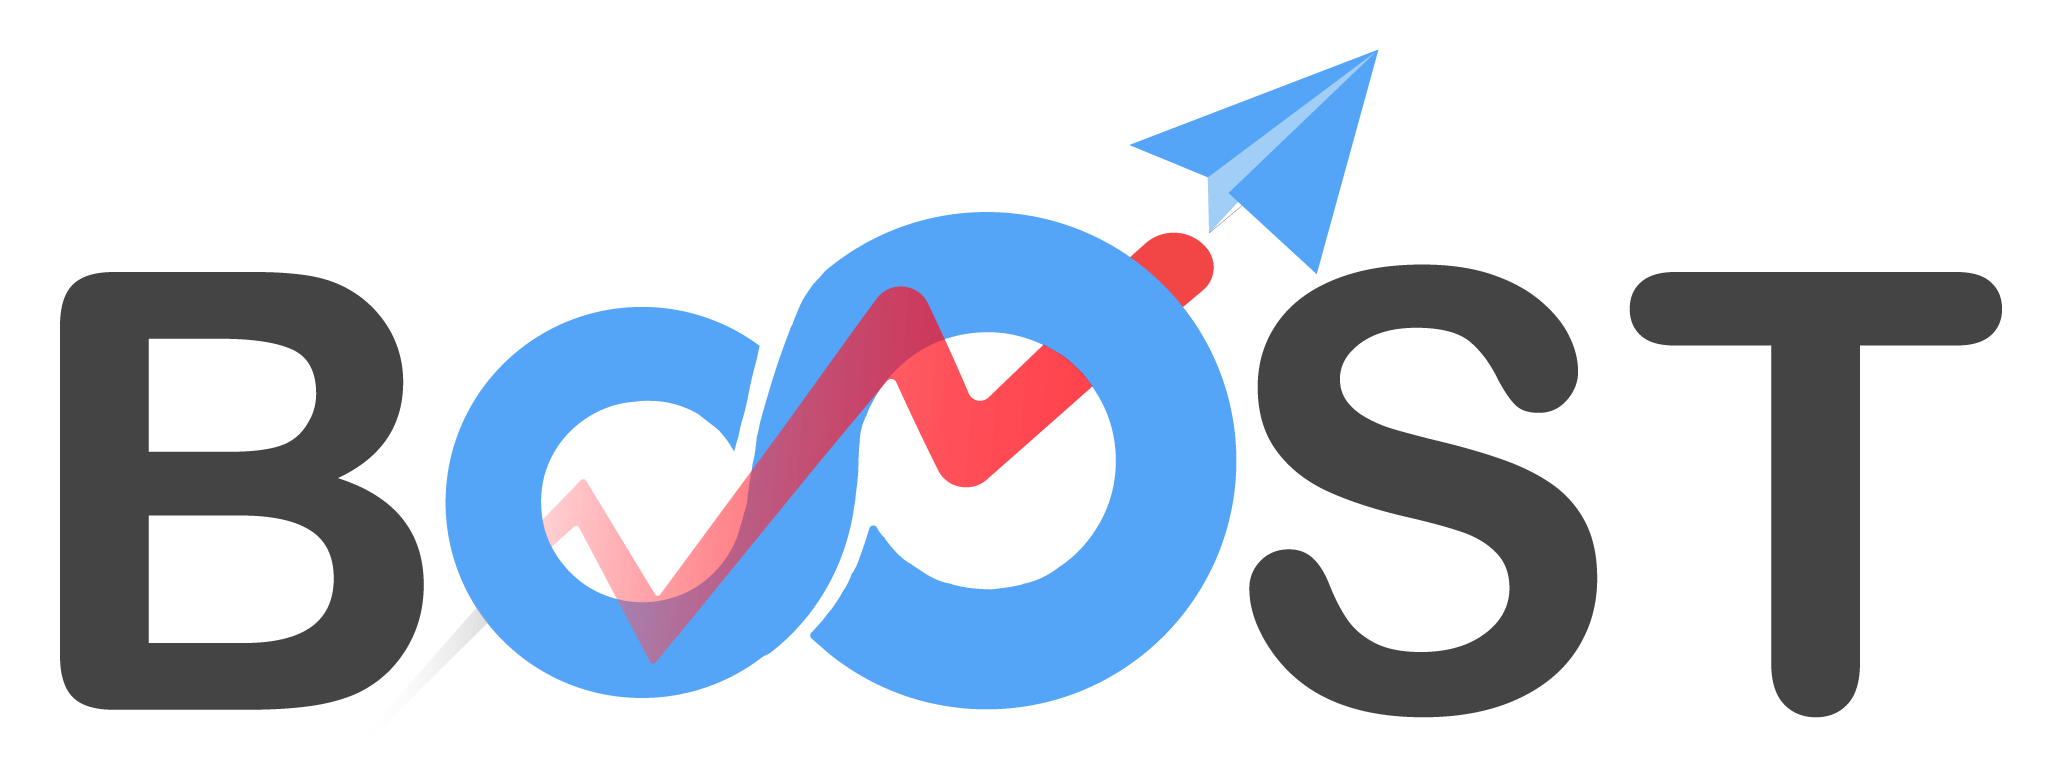 Boost.Link Technographics